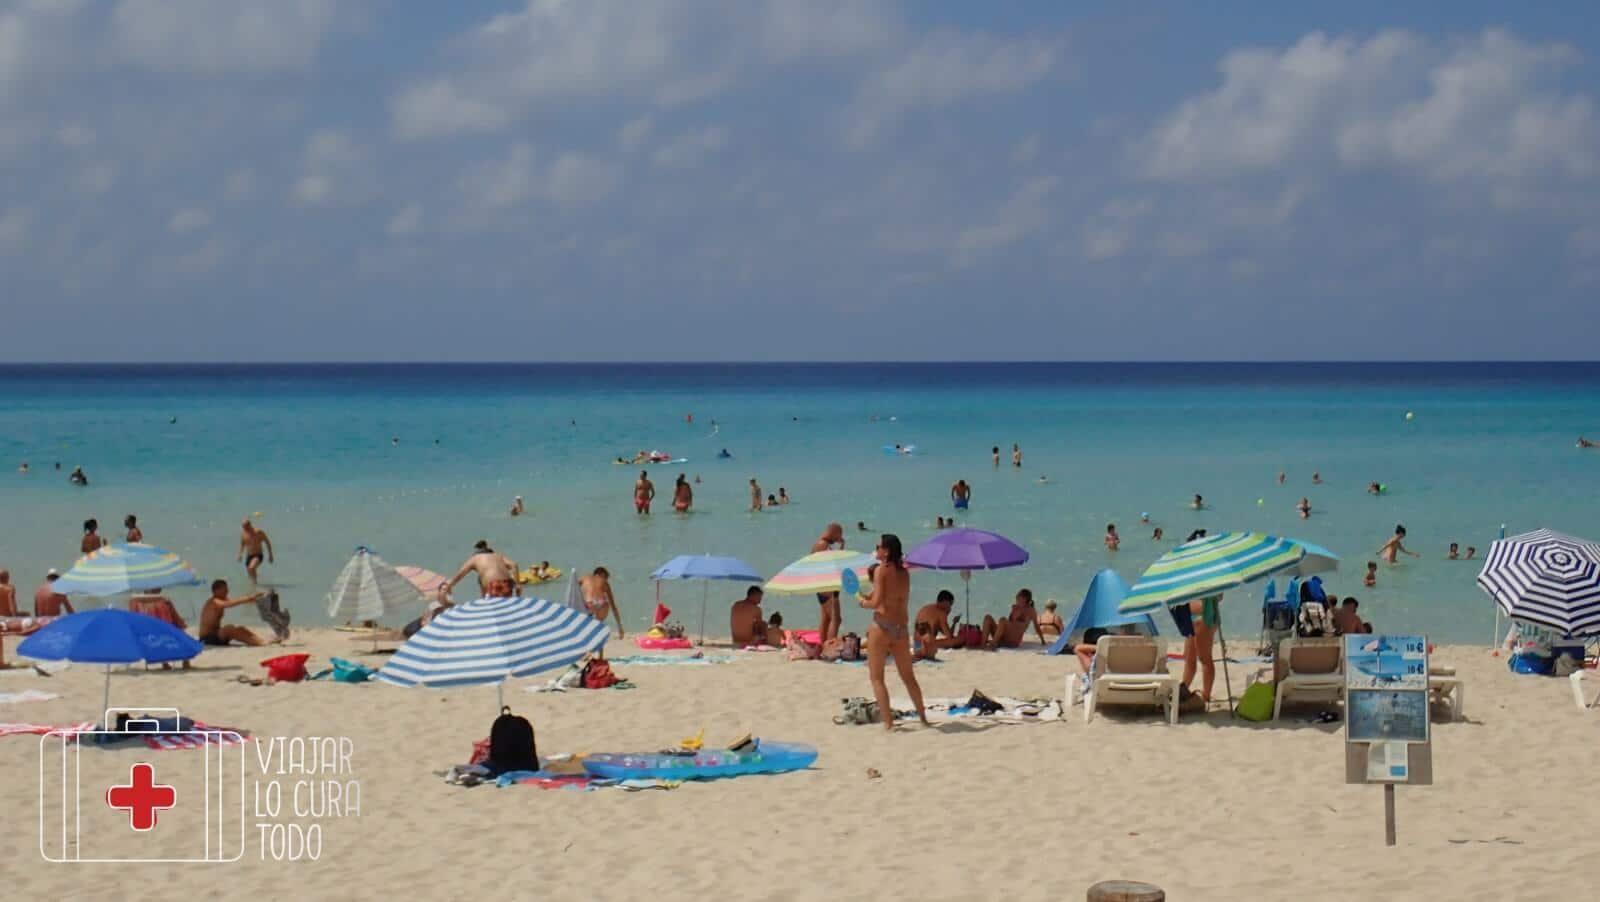 No he venido a Formentera buscando esto